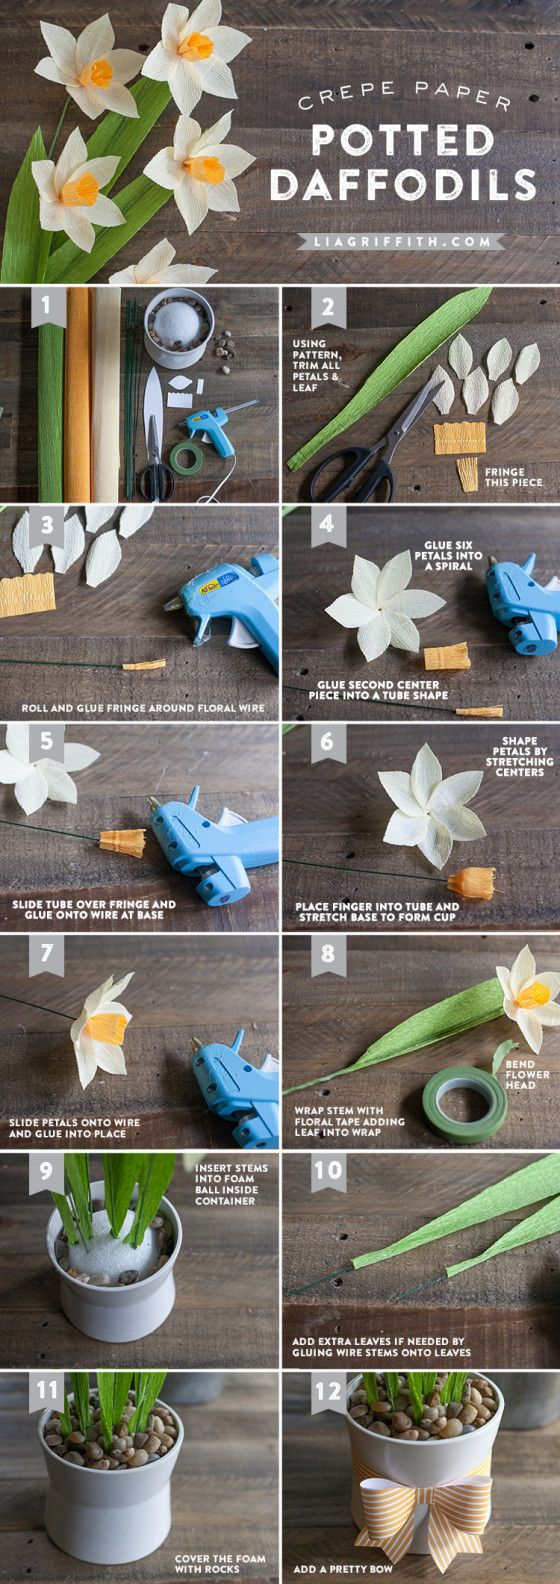 Paper daffodil tutorial: